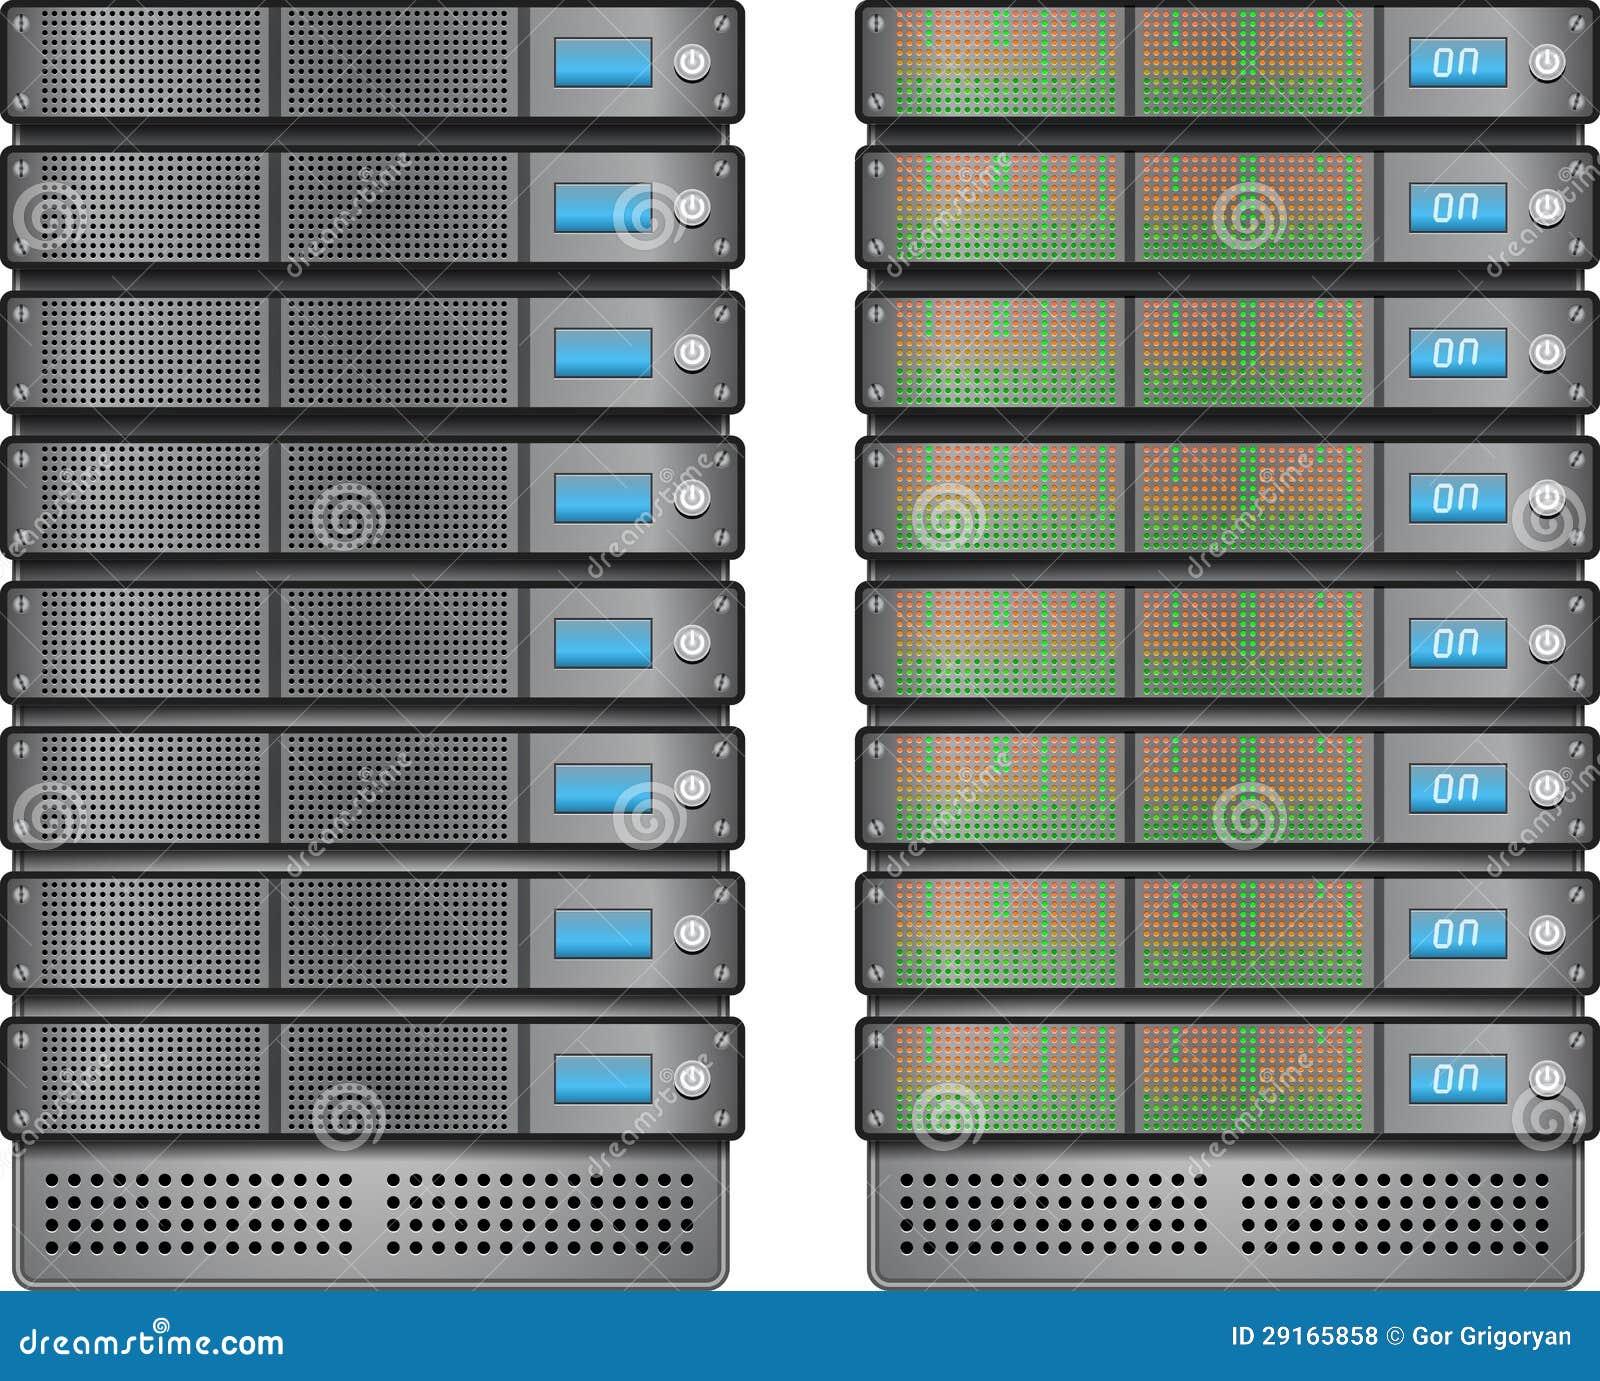 dedicated servers black friday deals January